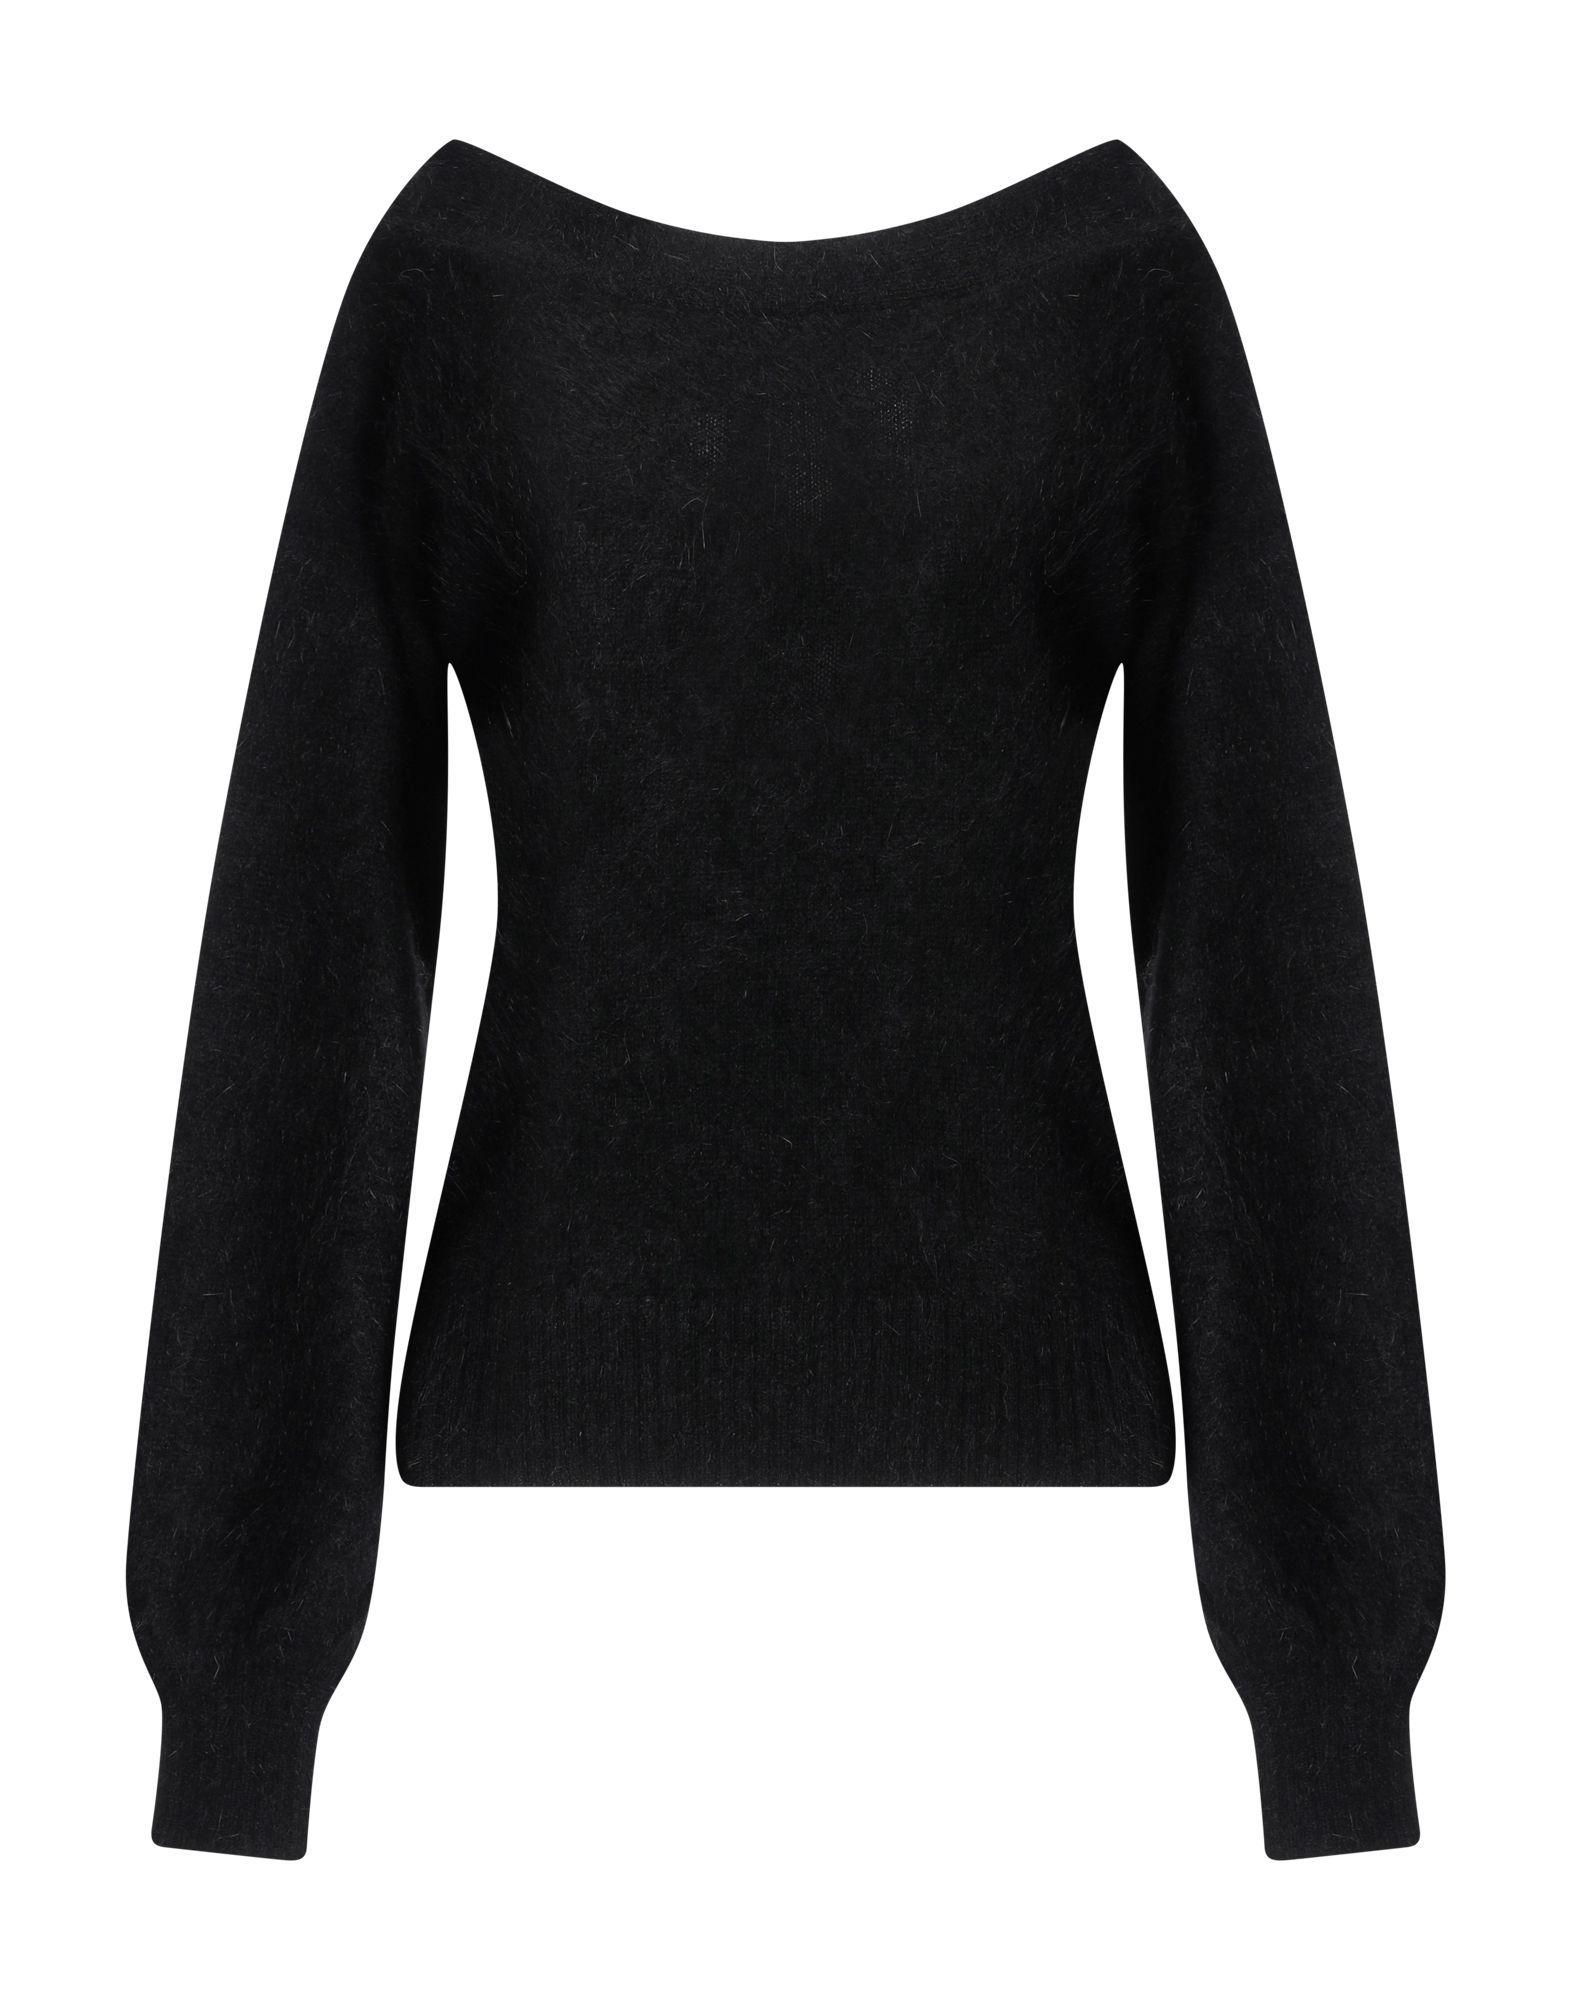 Knitwear Semicouture Black Women's Angora